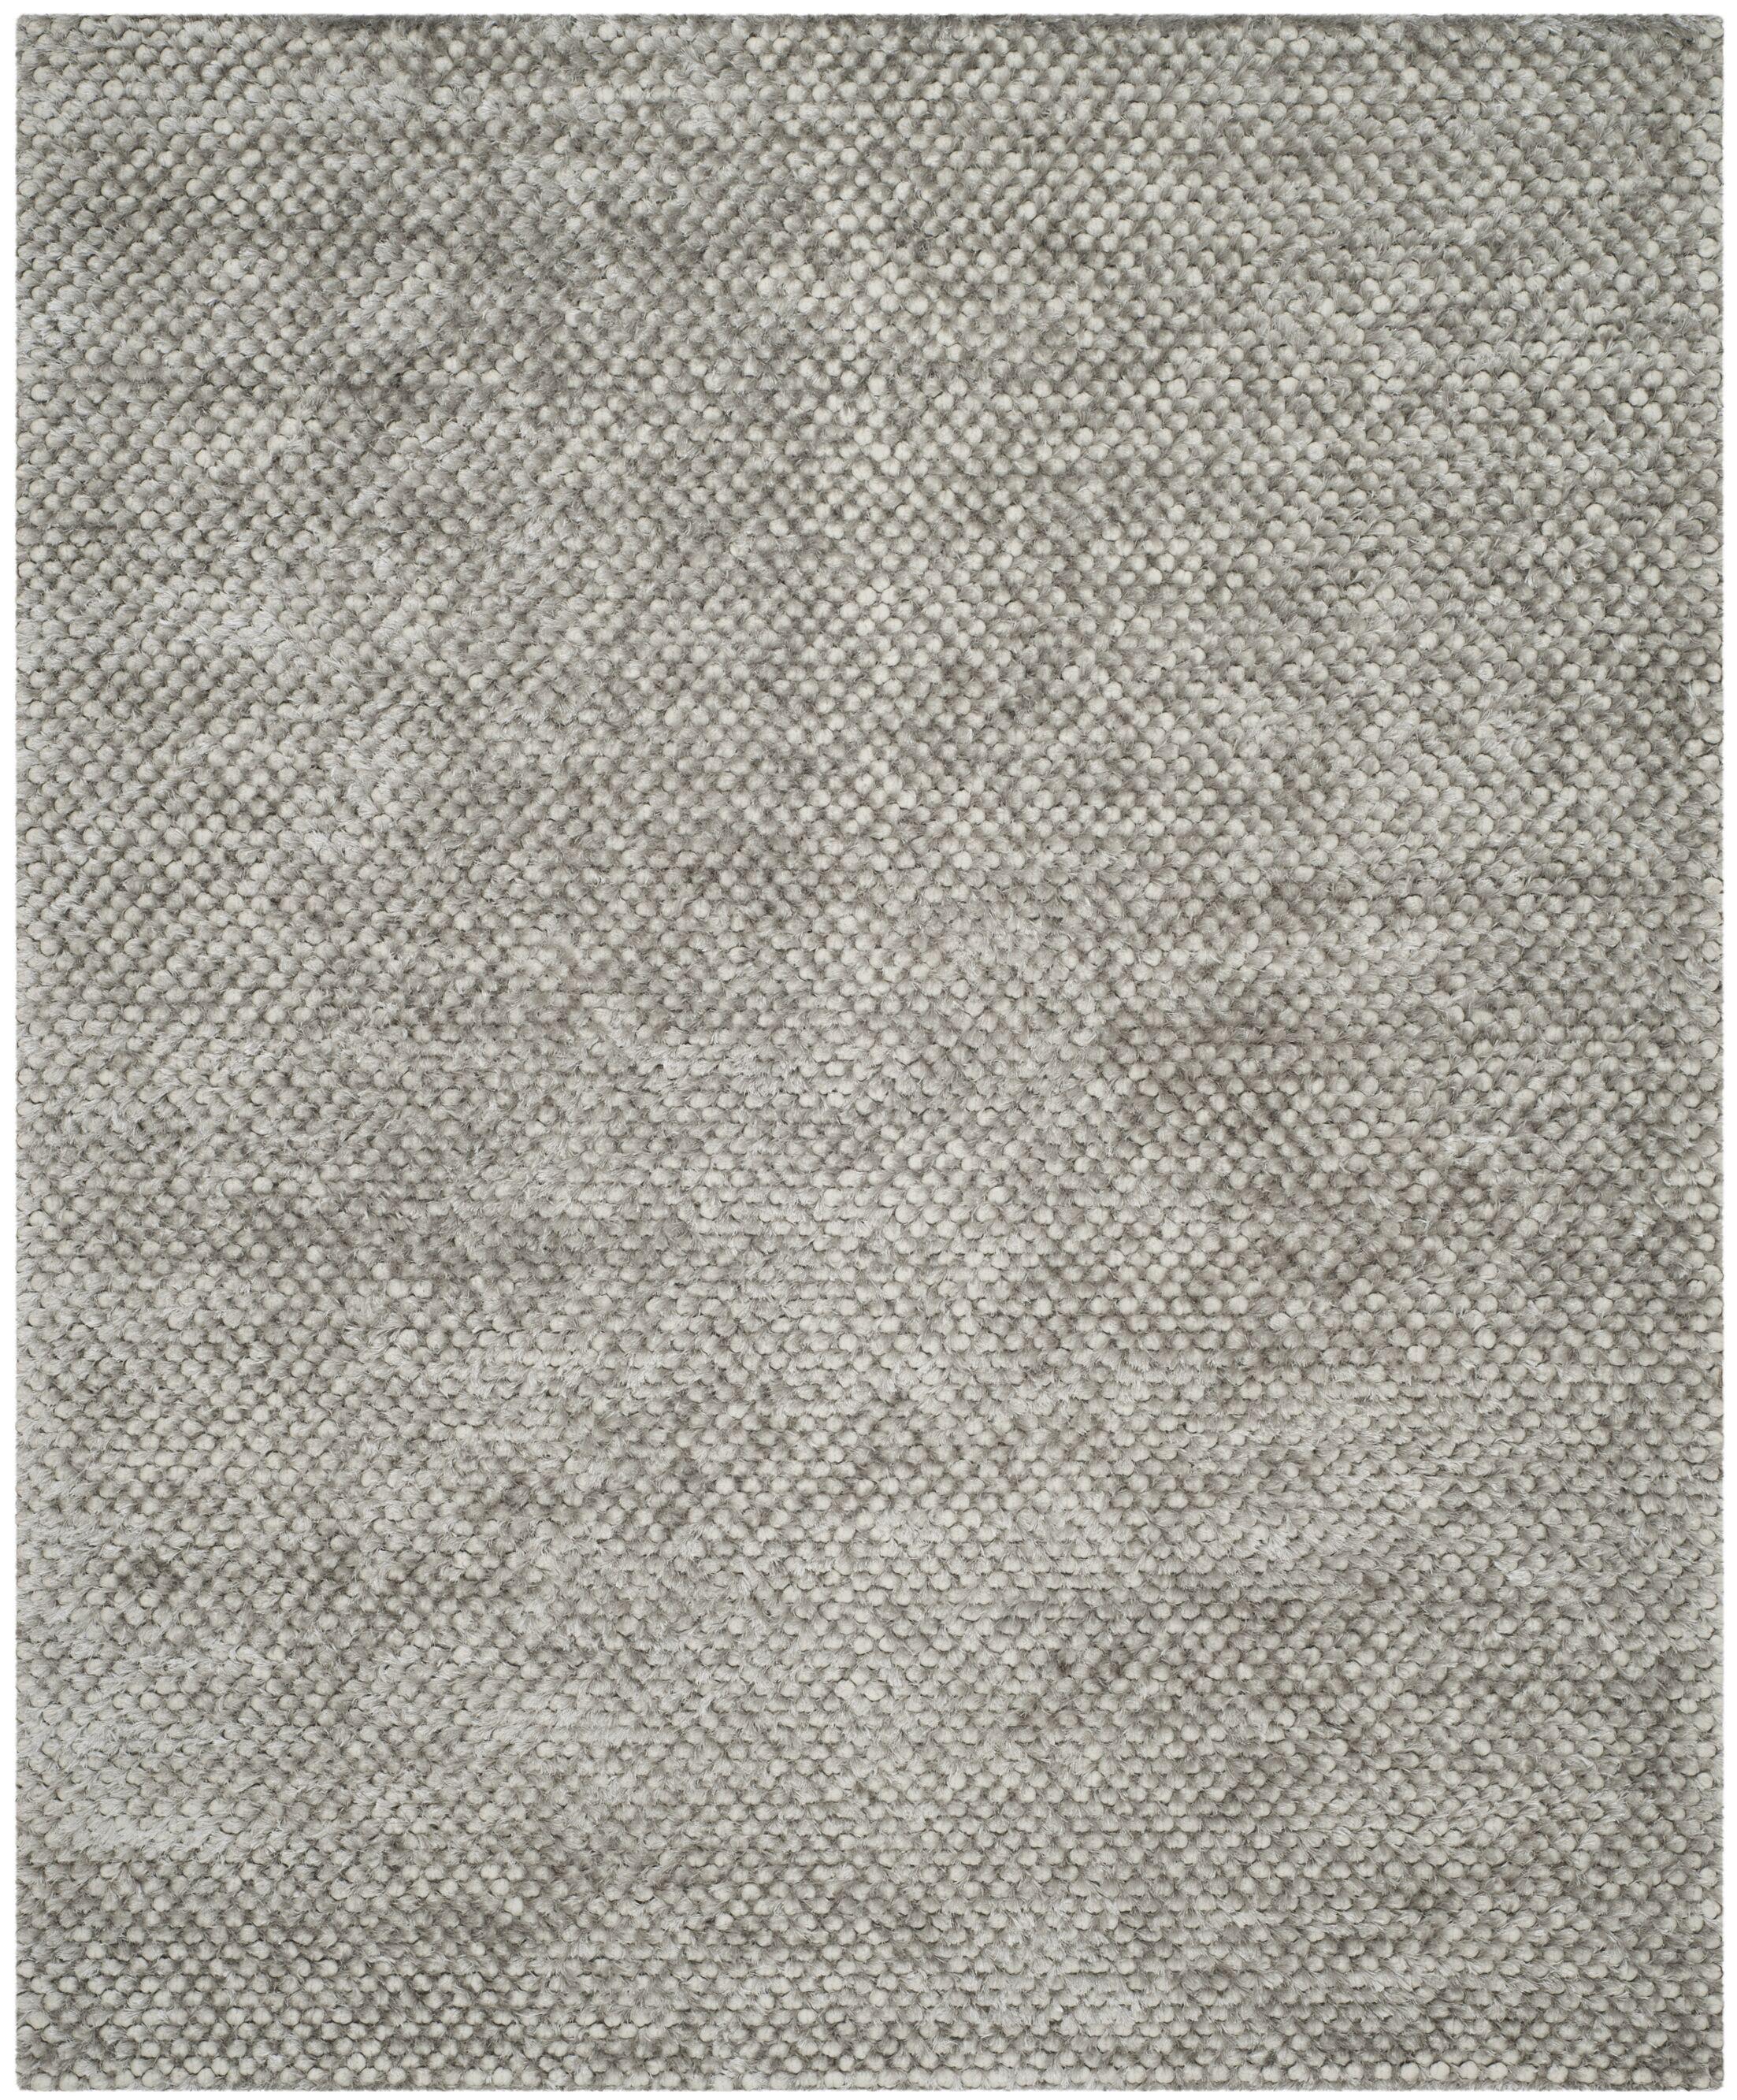 Maya Silver Rug Rug Size: Rectangle 8' x 10'